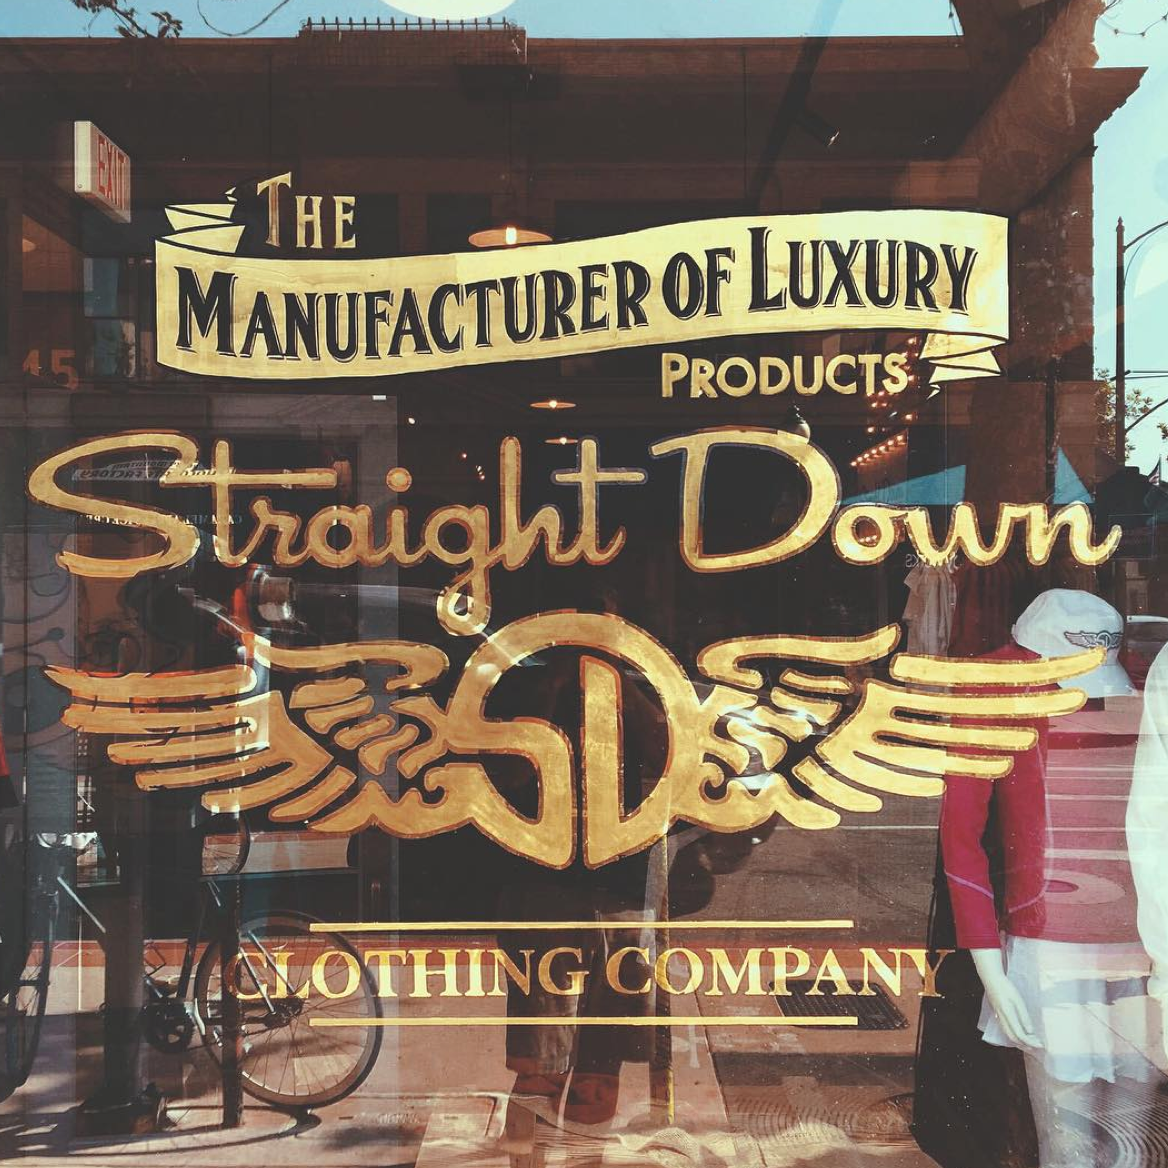 Straight Down Clothing Company    San Luis Obispo, CA